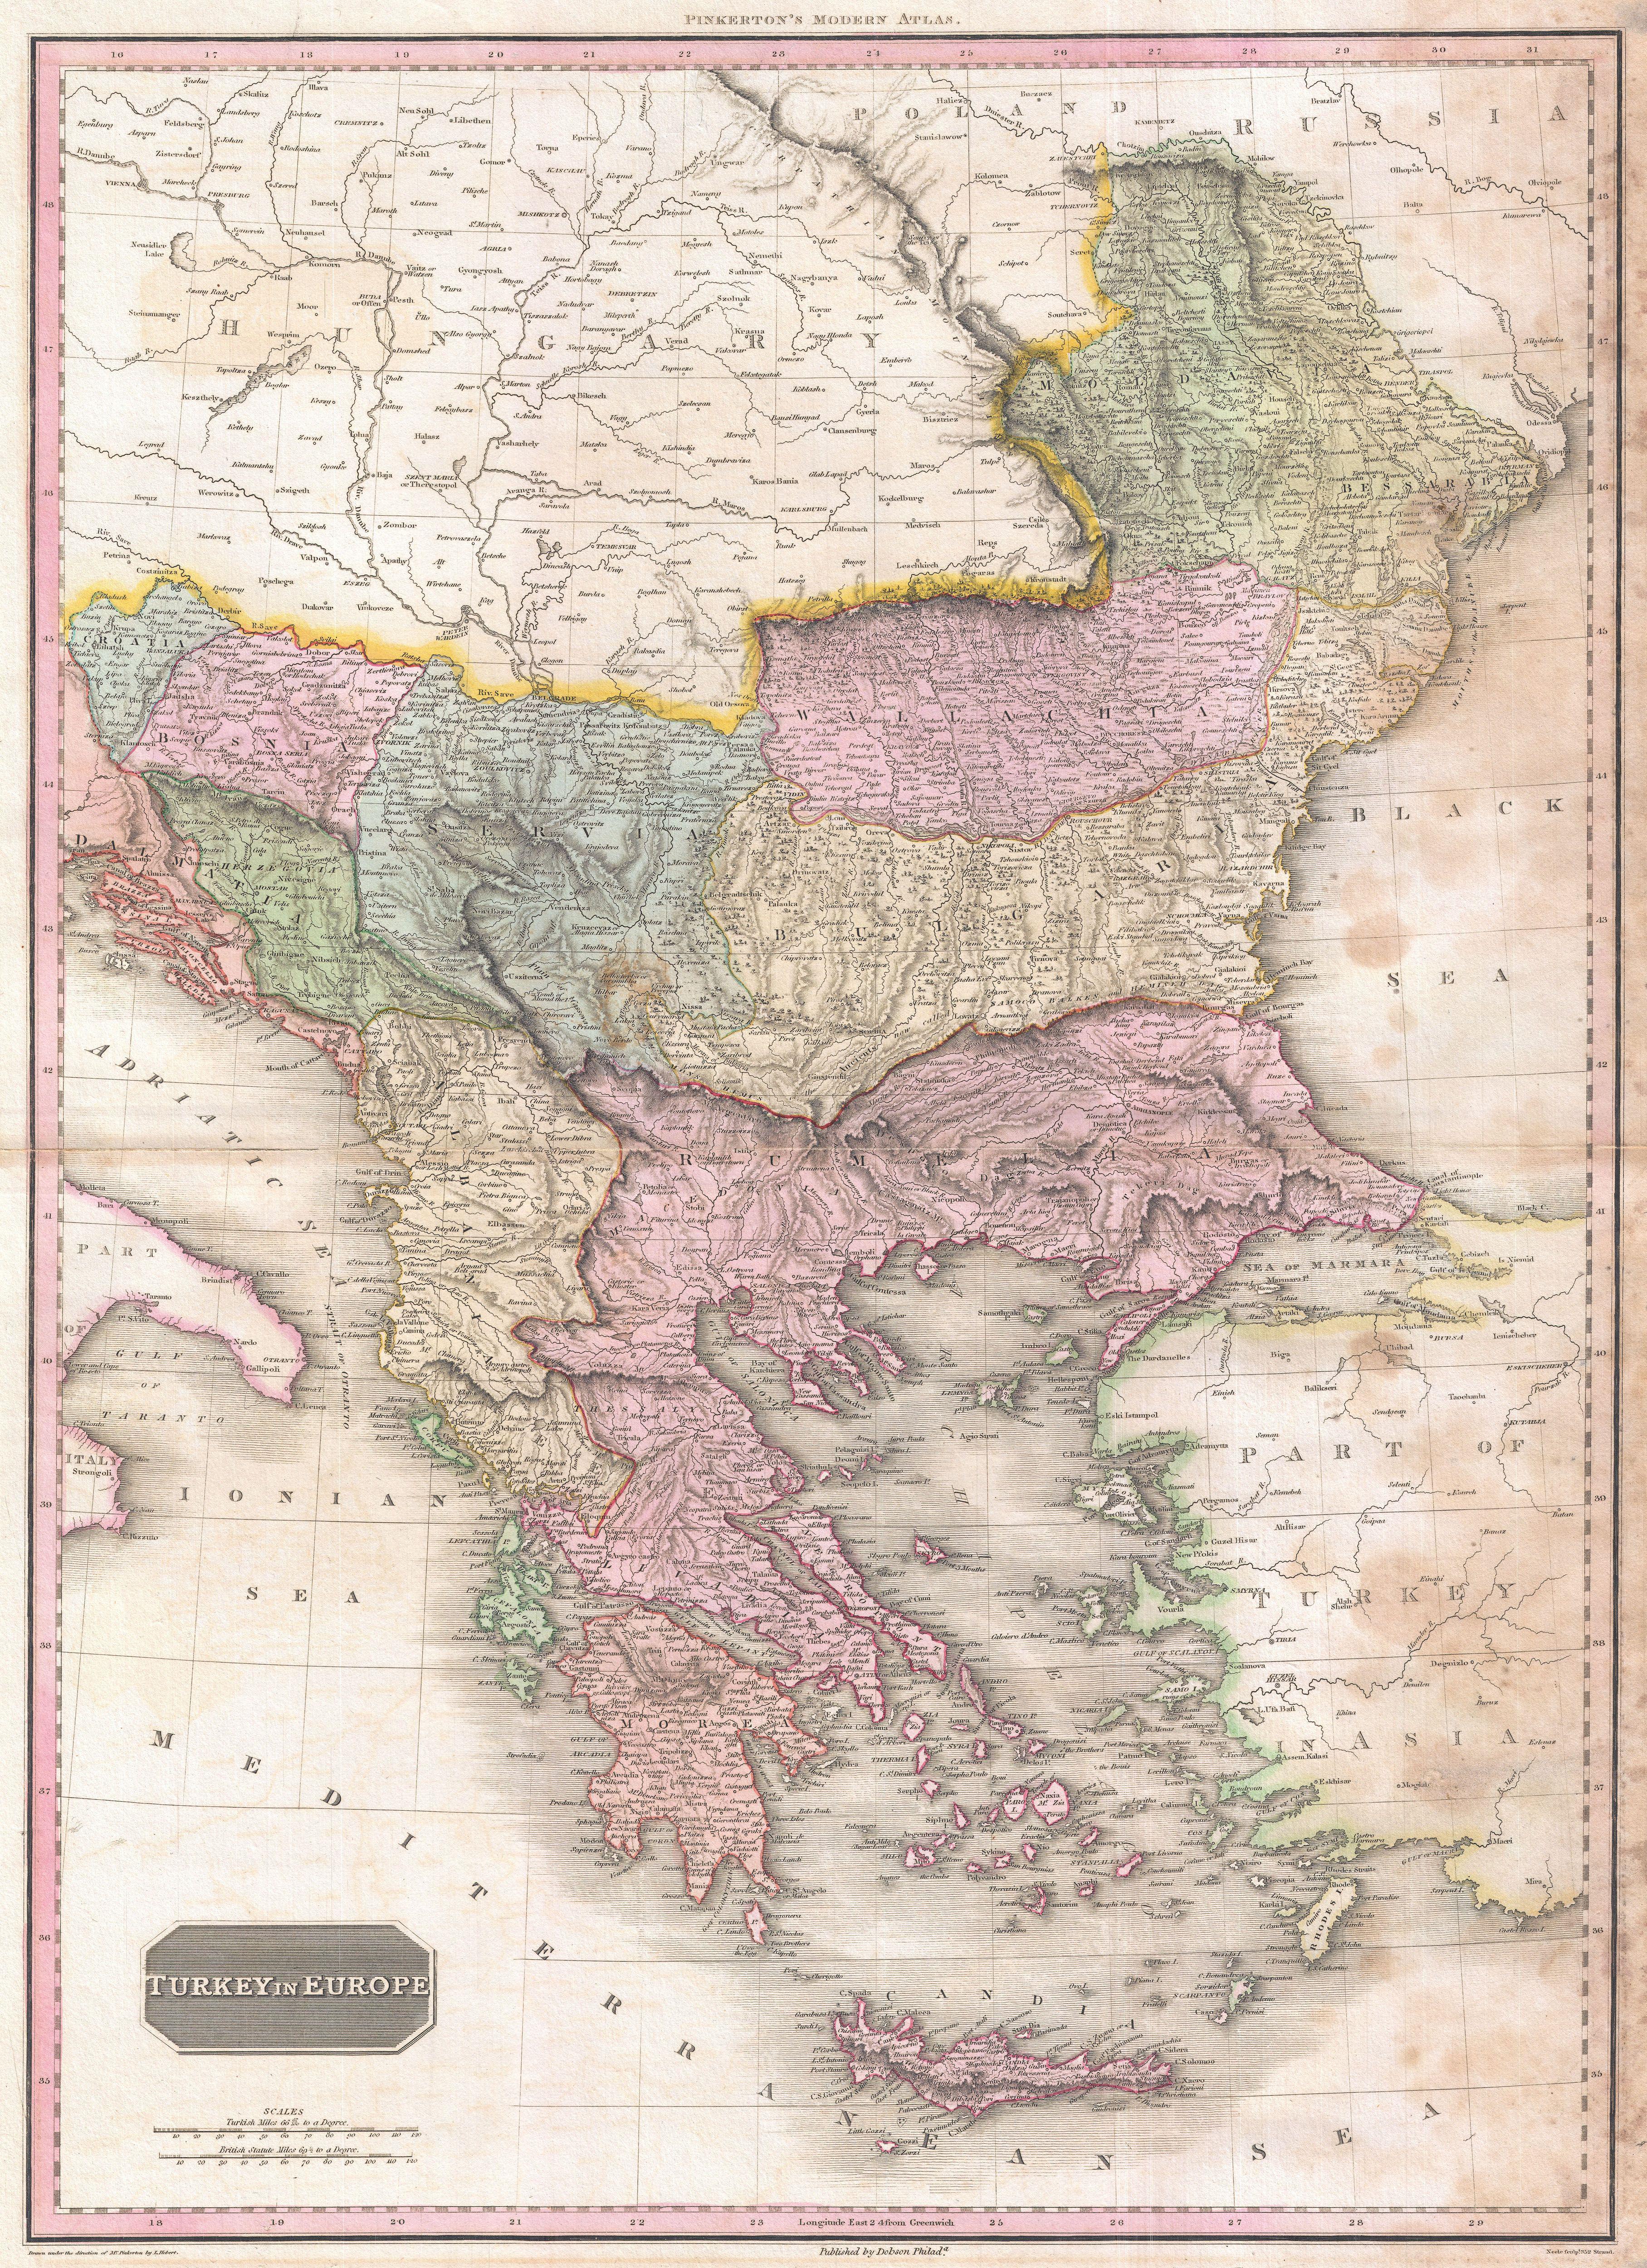 Turkey On Europe Map.File 1818 Pinkerton Map Of Turkey In Europe Greece Andamp The